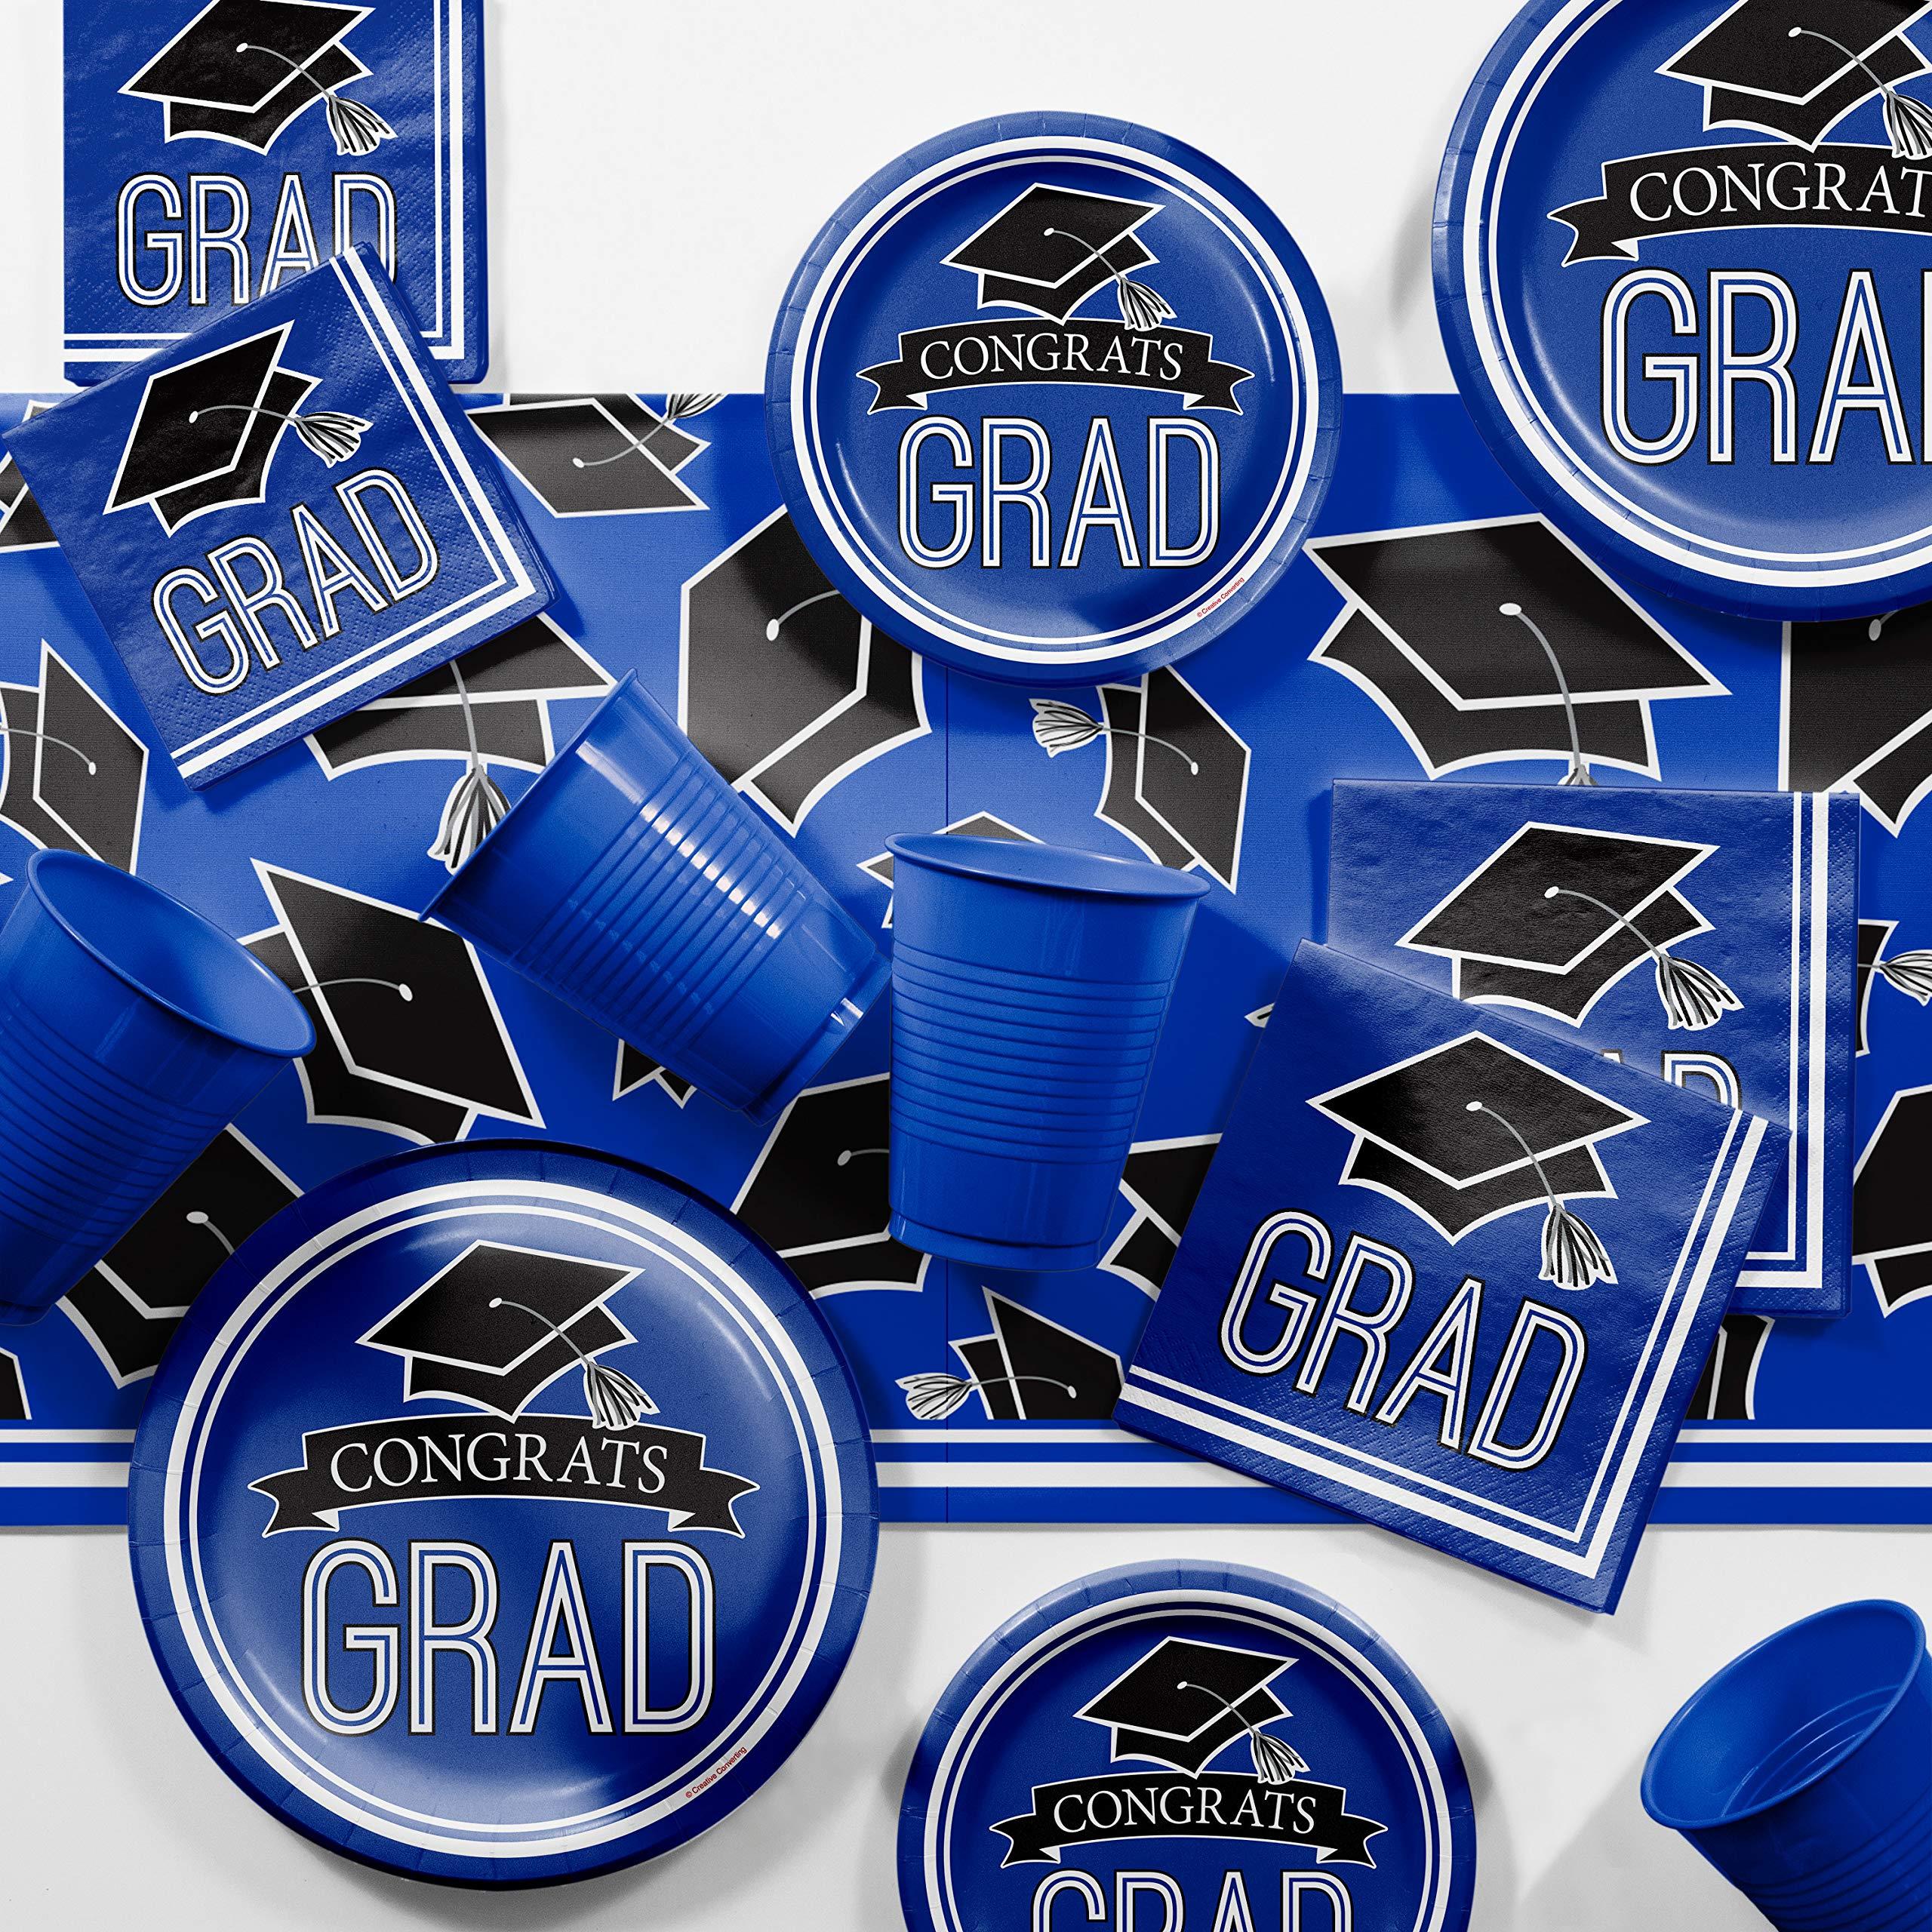 Graduation School Spirit Blue Party Supplies Kit, Serves 36